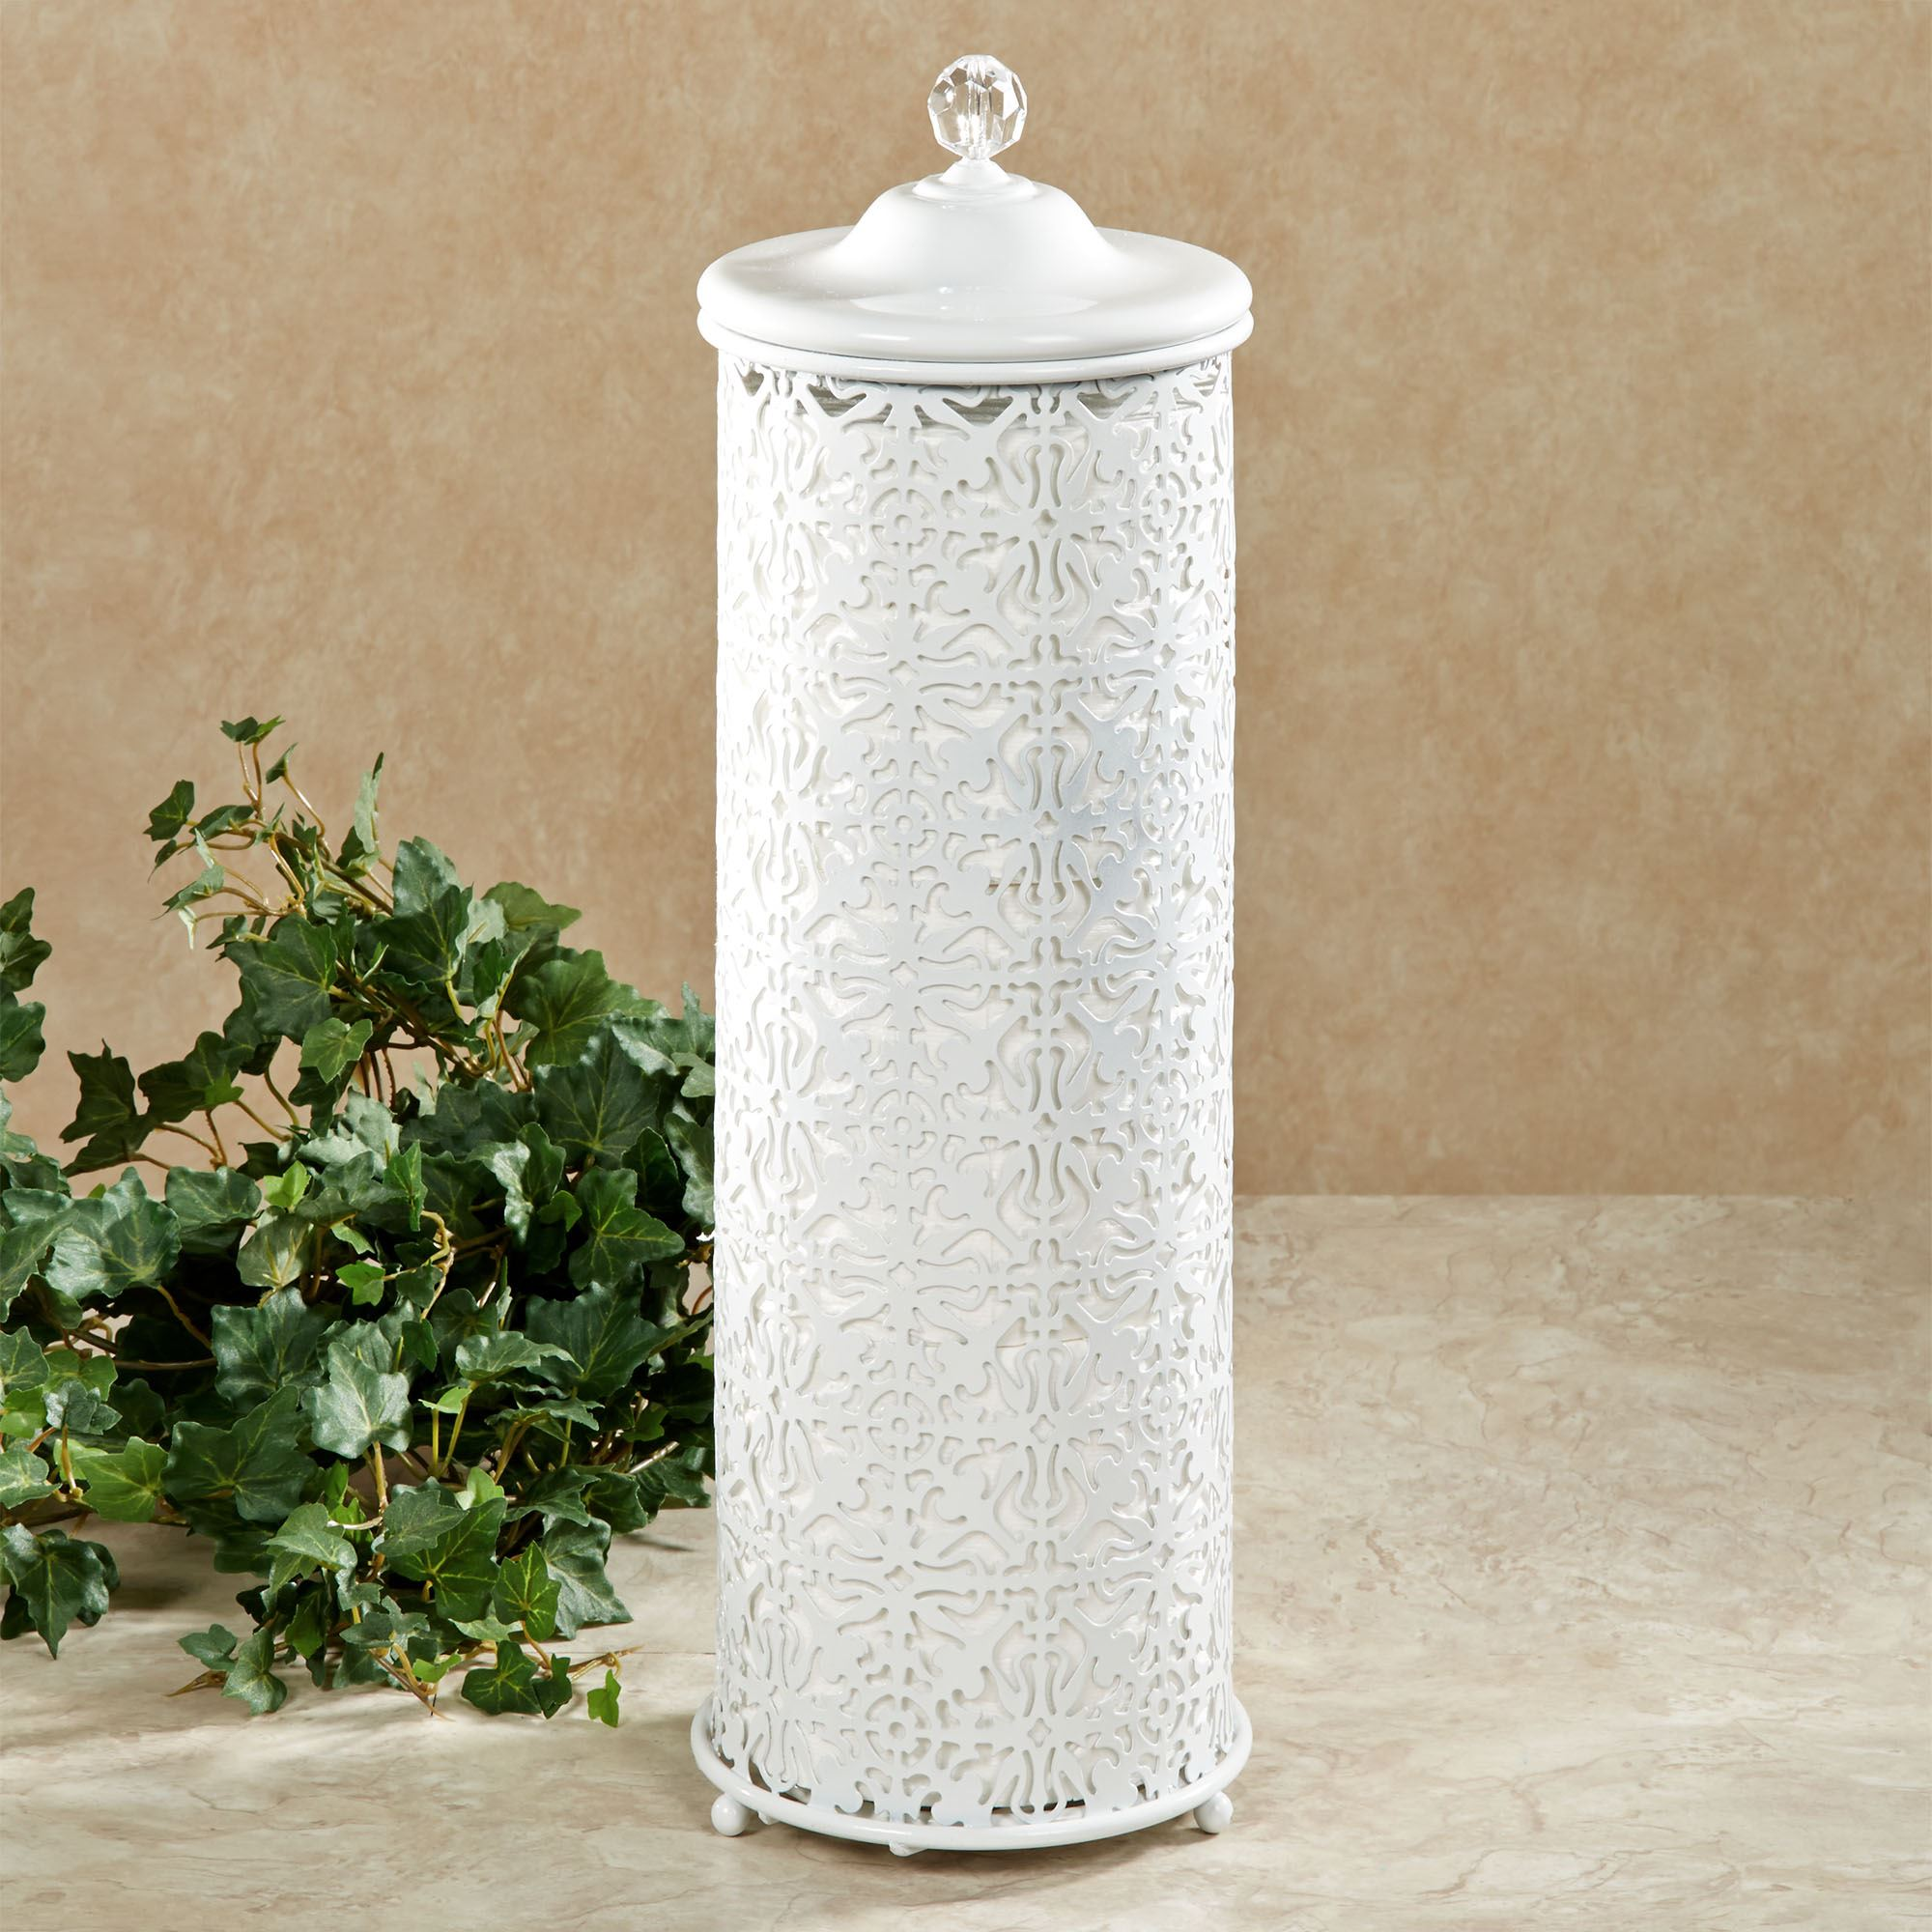 Lace Design Metal Toilet Tissue Holder